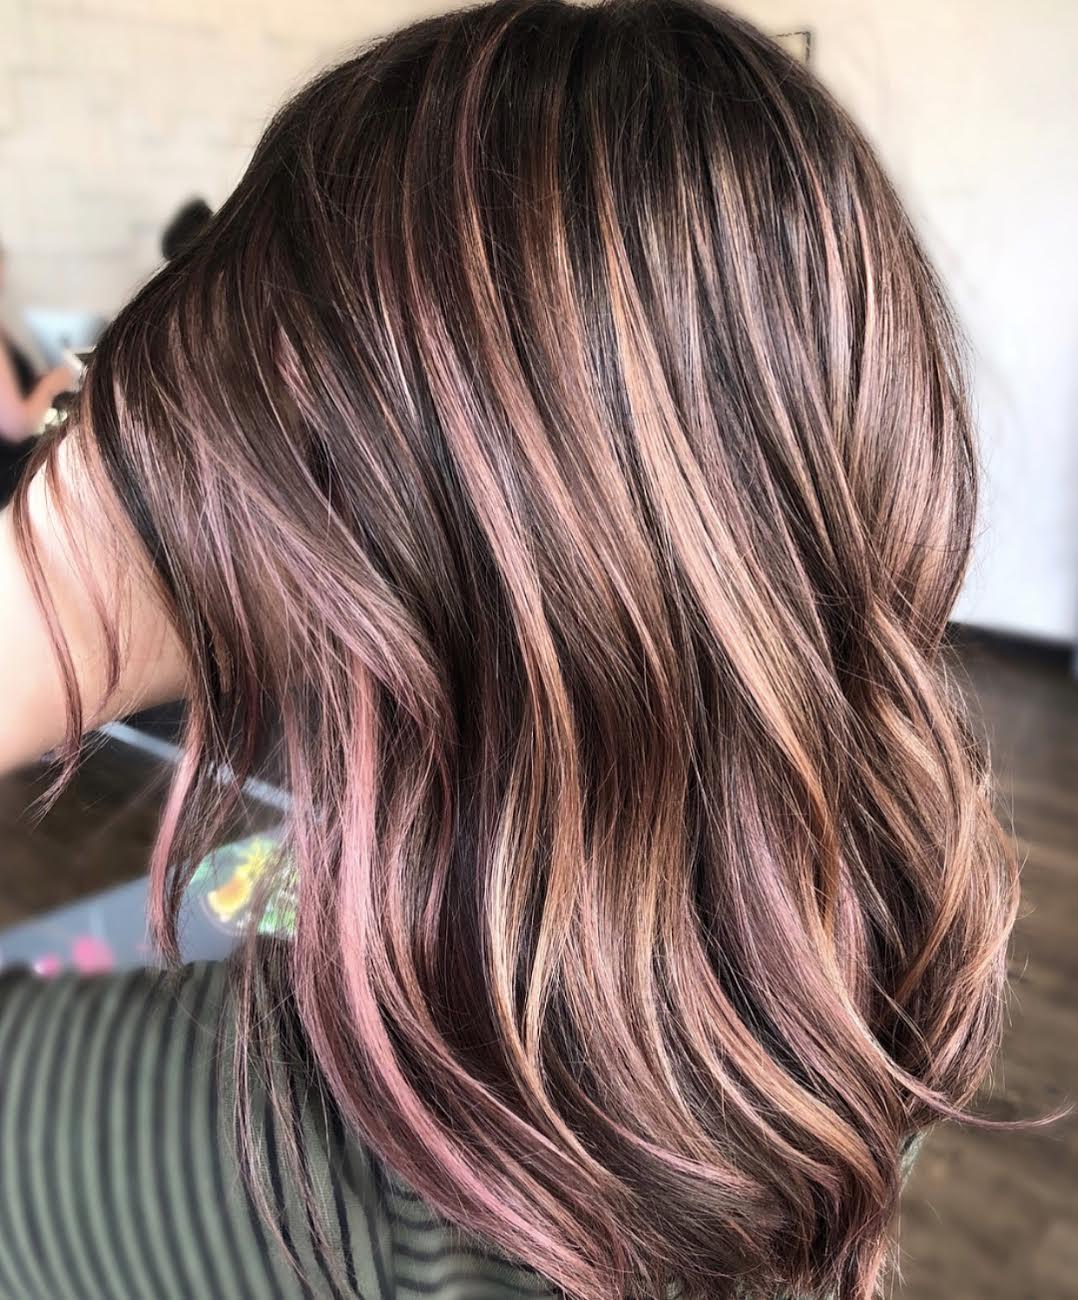 Mauve Hair Color by Jessica at Tangerine Salon Dallas